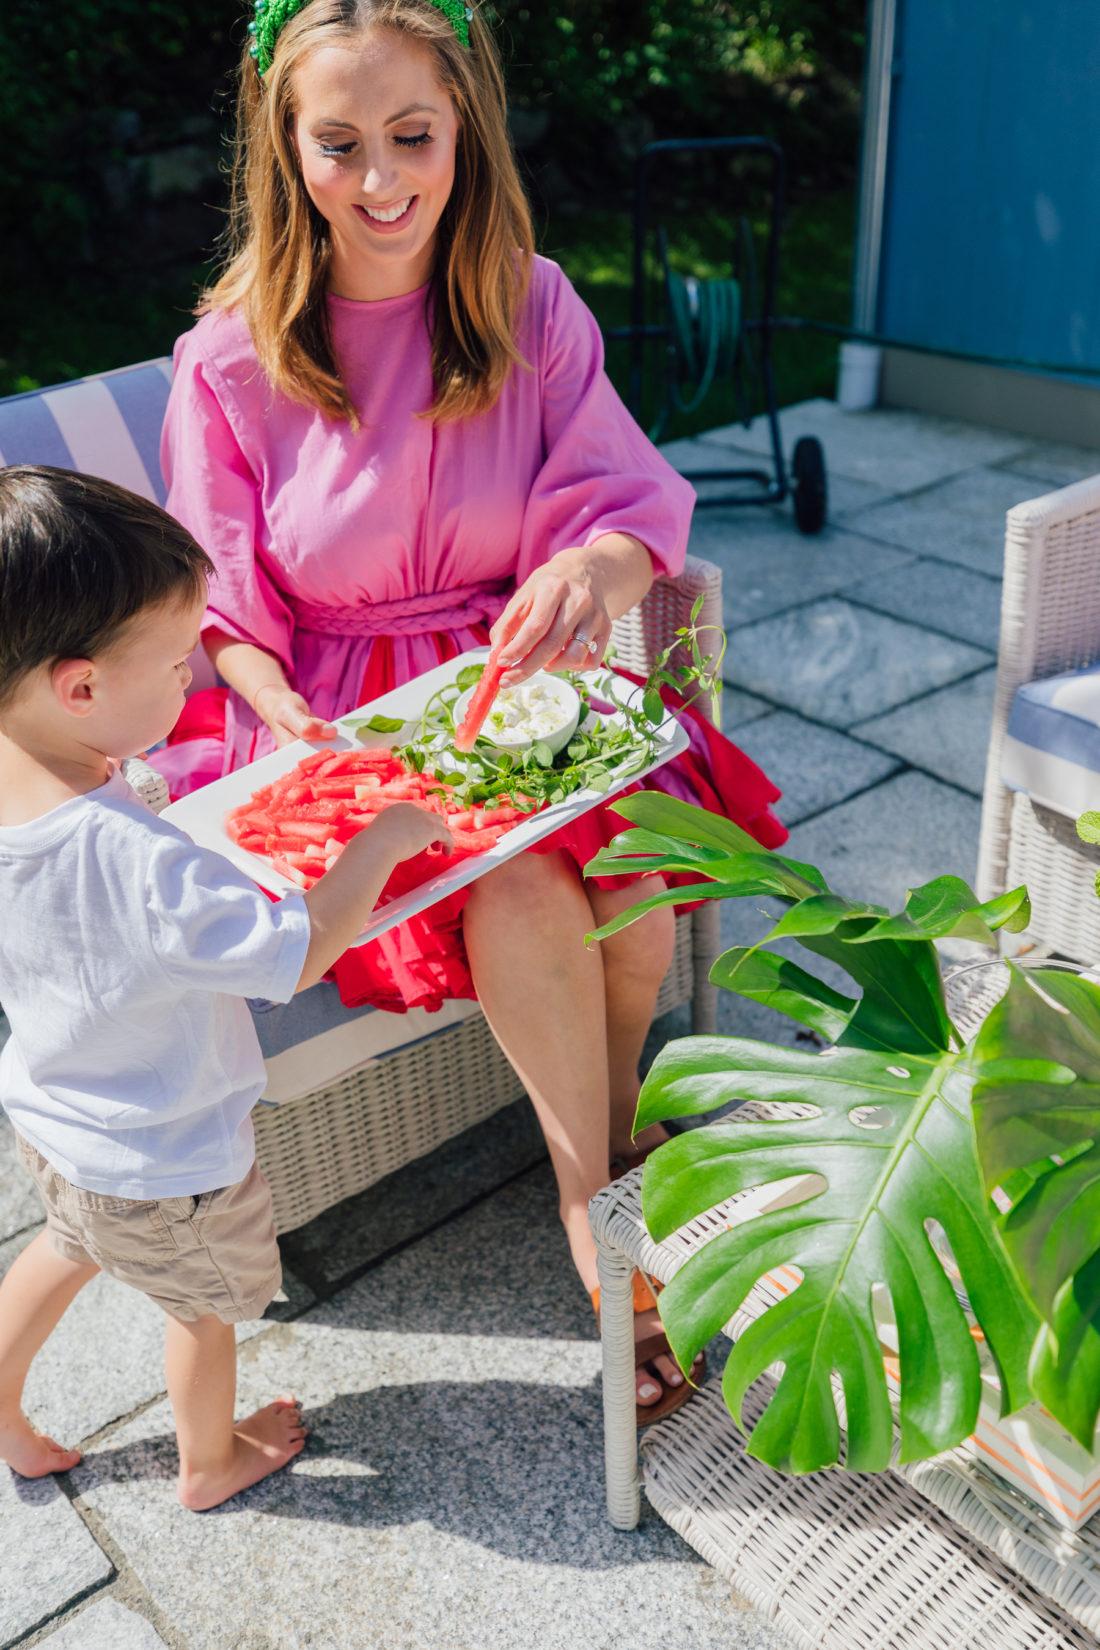 Eva Amurri Martino serves some watermelon fries to her son Major